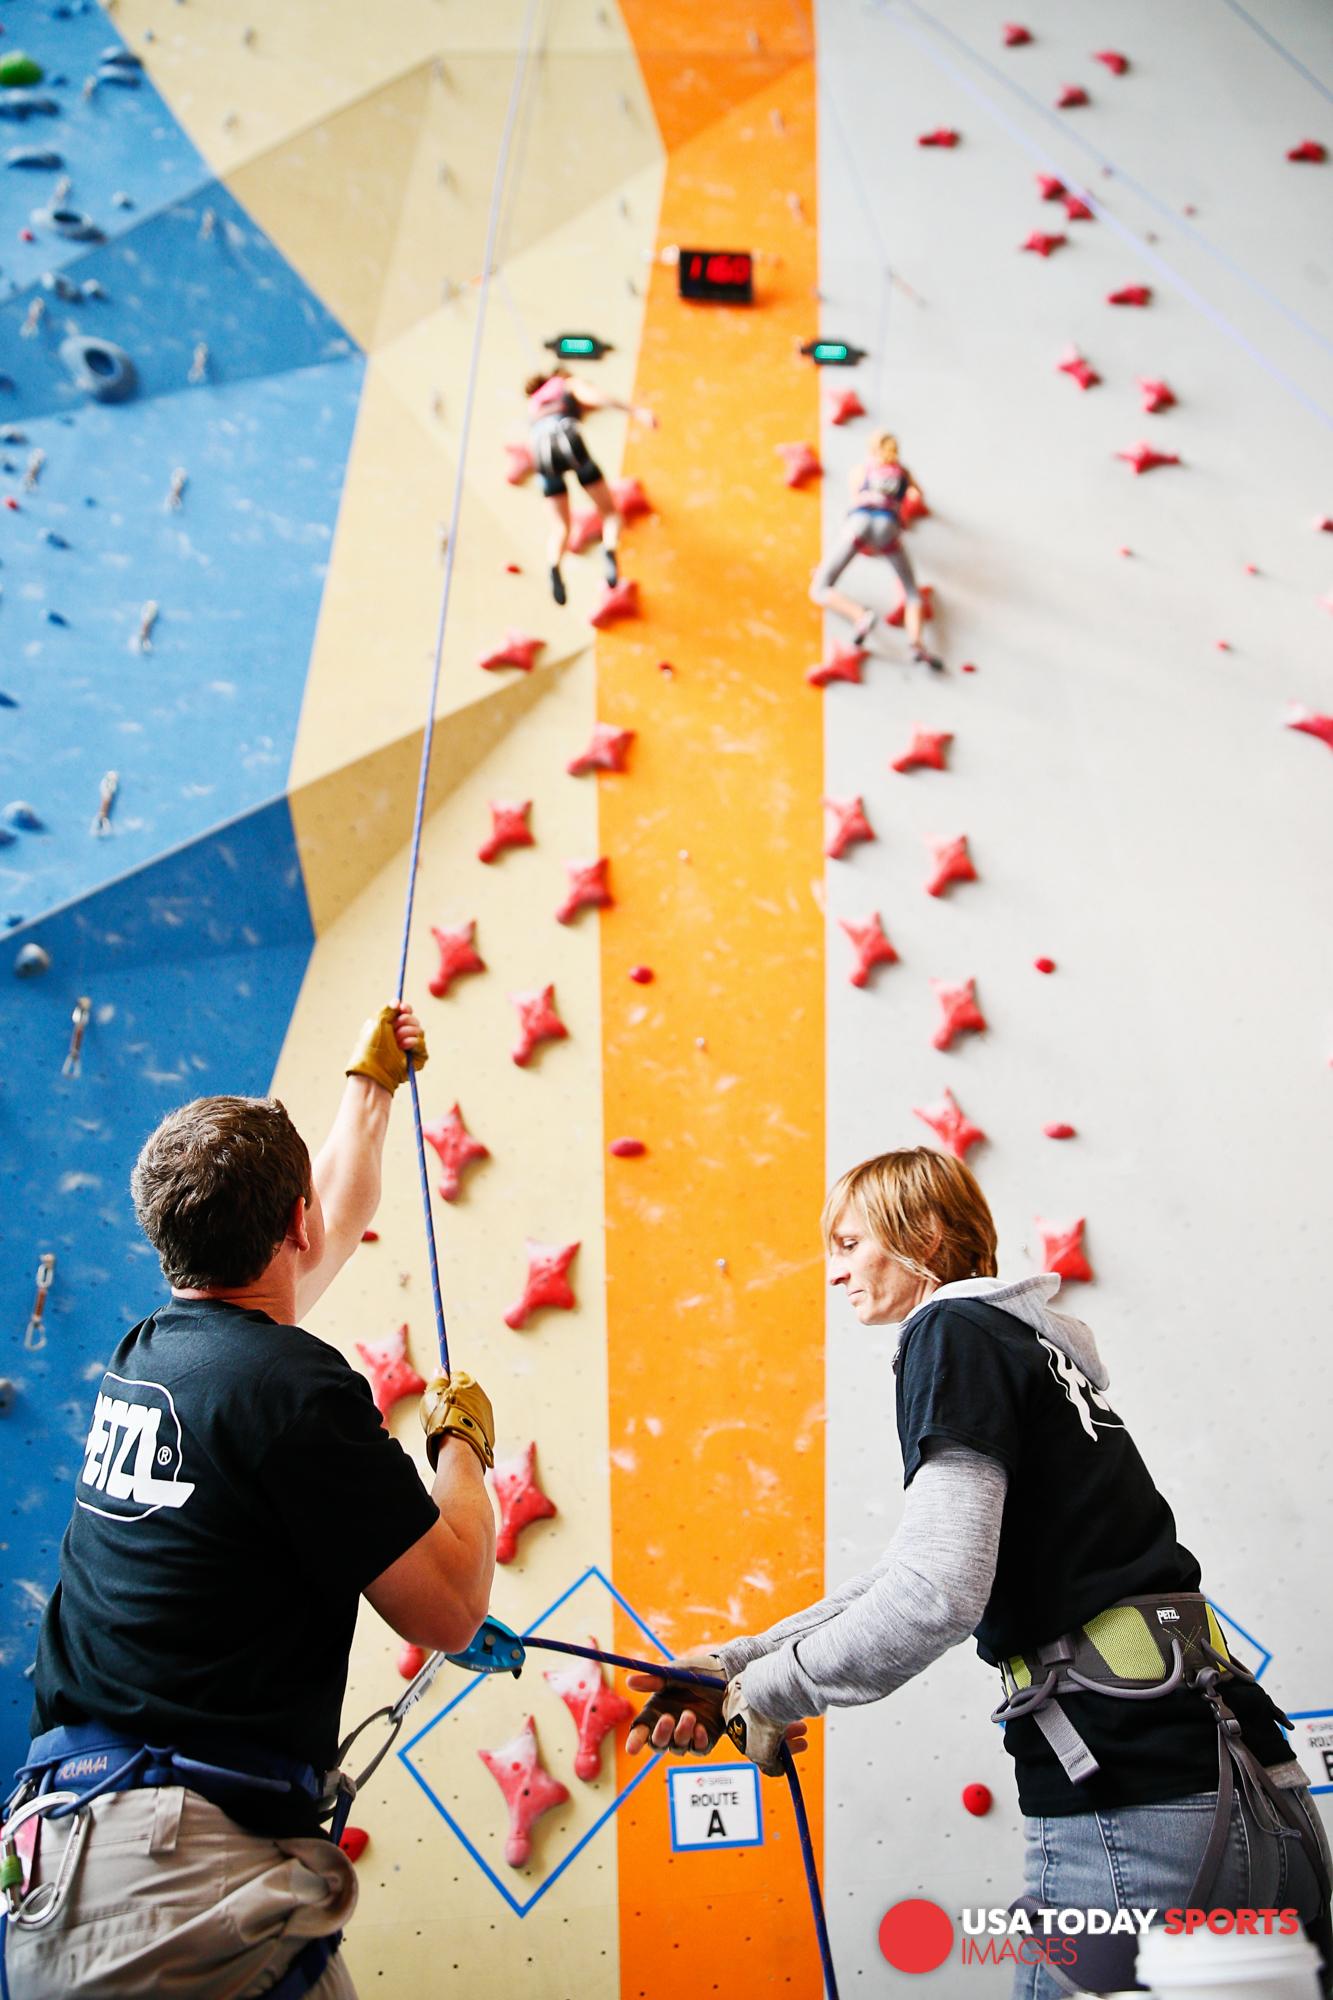 Garrett_Reid_atlanta_advertising_commercial_photographer_sport_and_speed_youth_national_chap_climbing-9.jpg